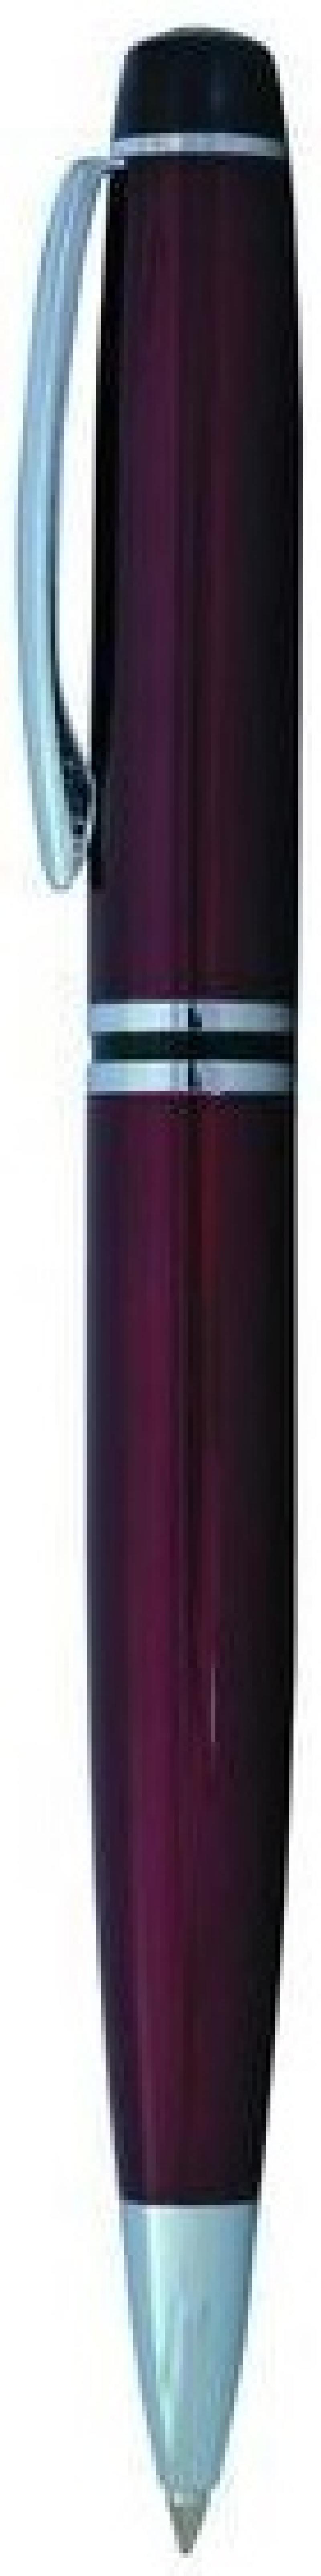 Шариковая ручка автоматическая Index IMWT1136/RD/бшк синий 0.5 мм IMWT1136/RD/бшк цена